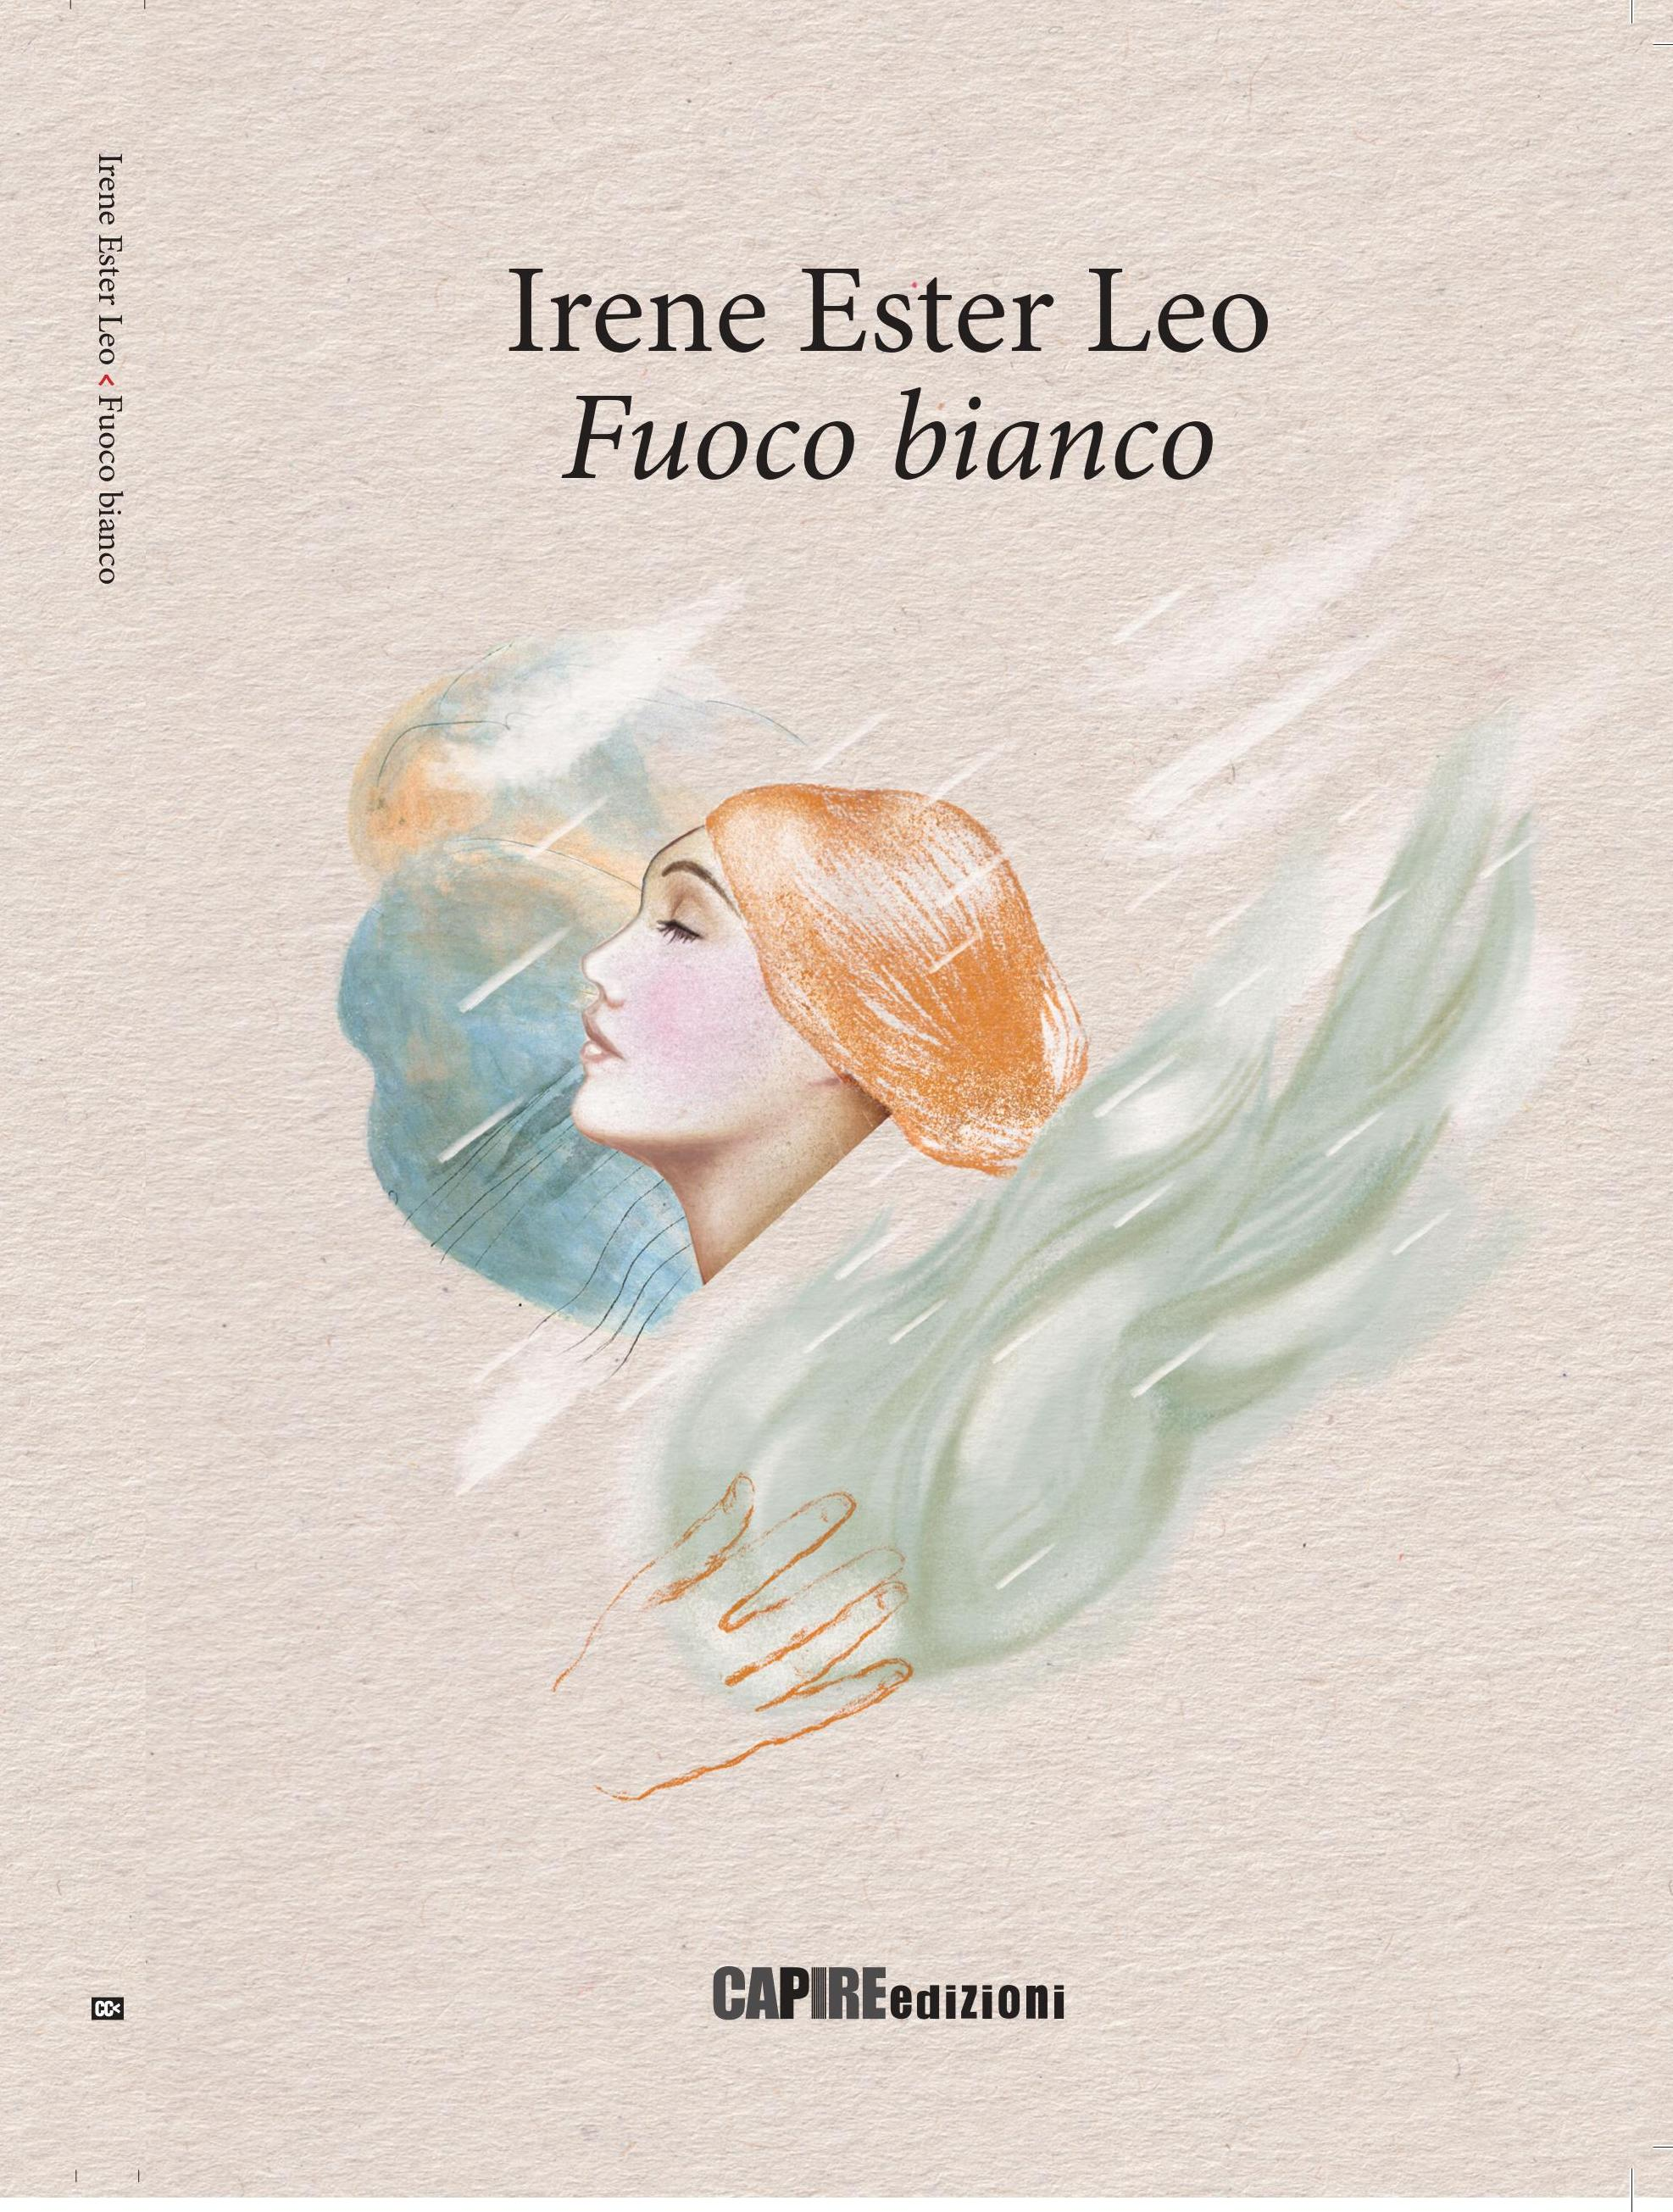 irene-ester-leo-fuoco-bianco